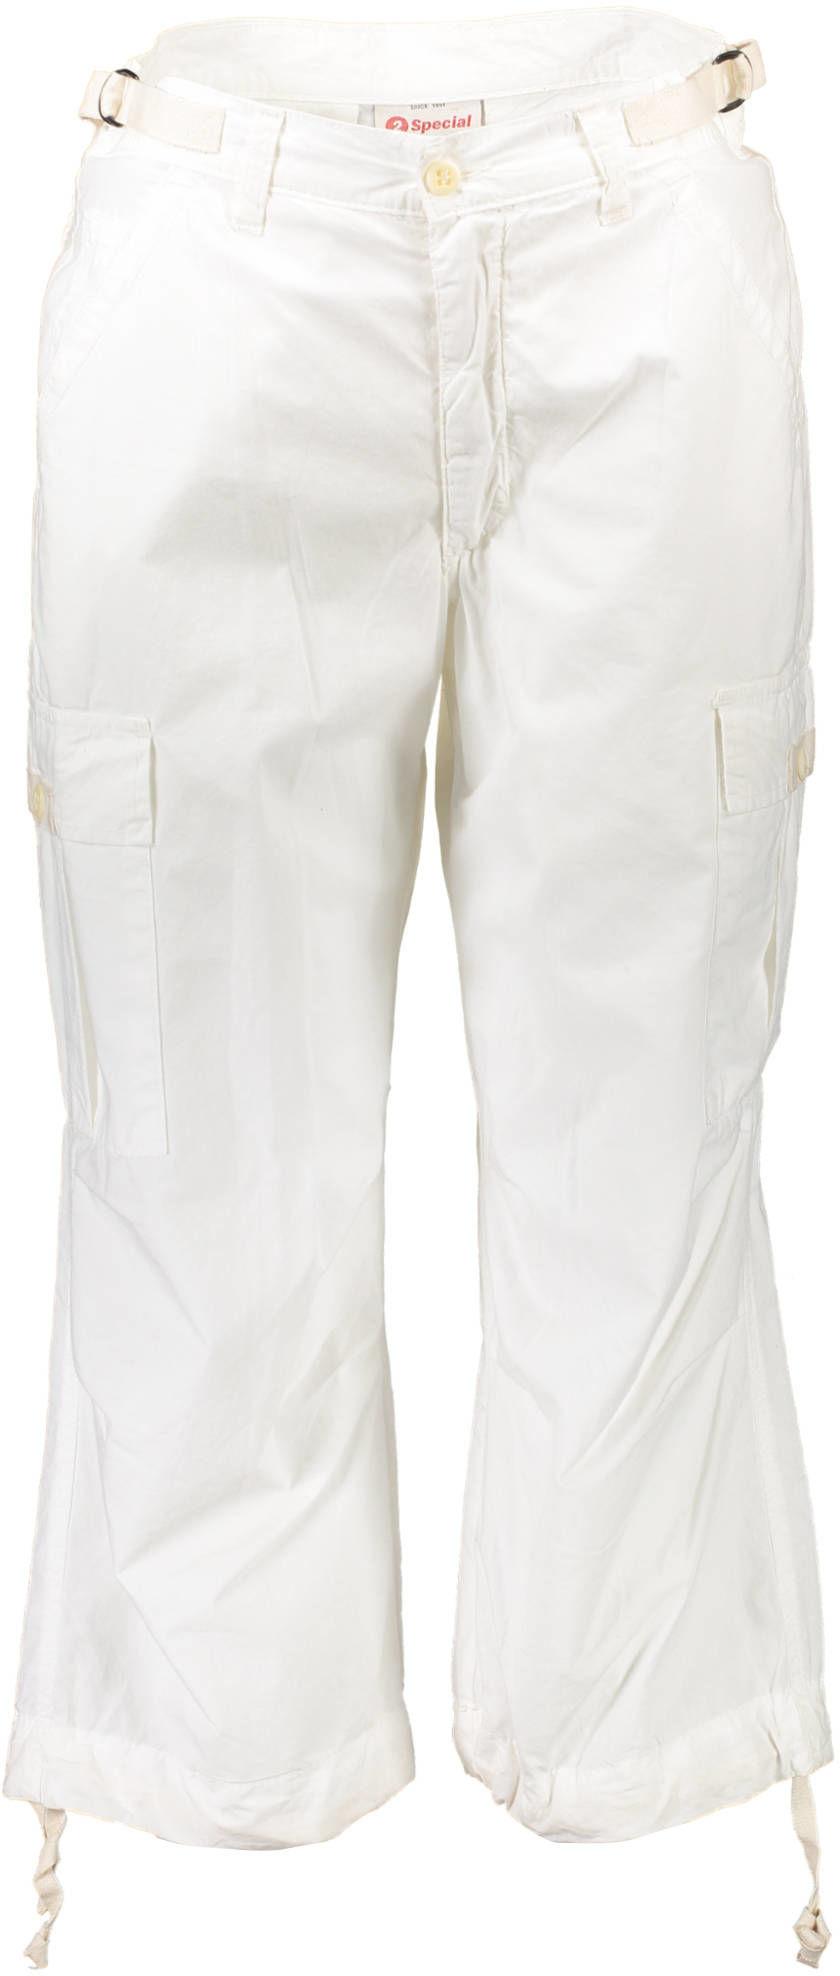 2 spodnie SPECJALNE Capri Męskie